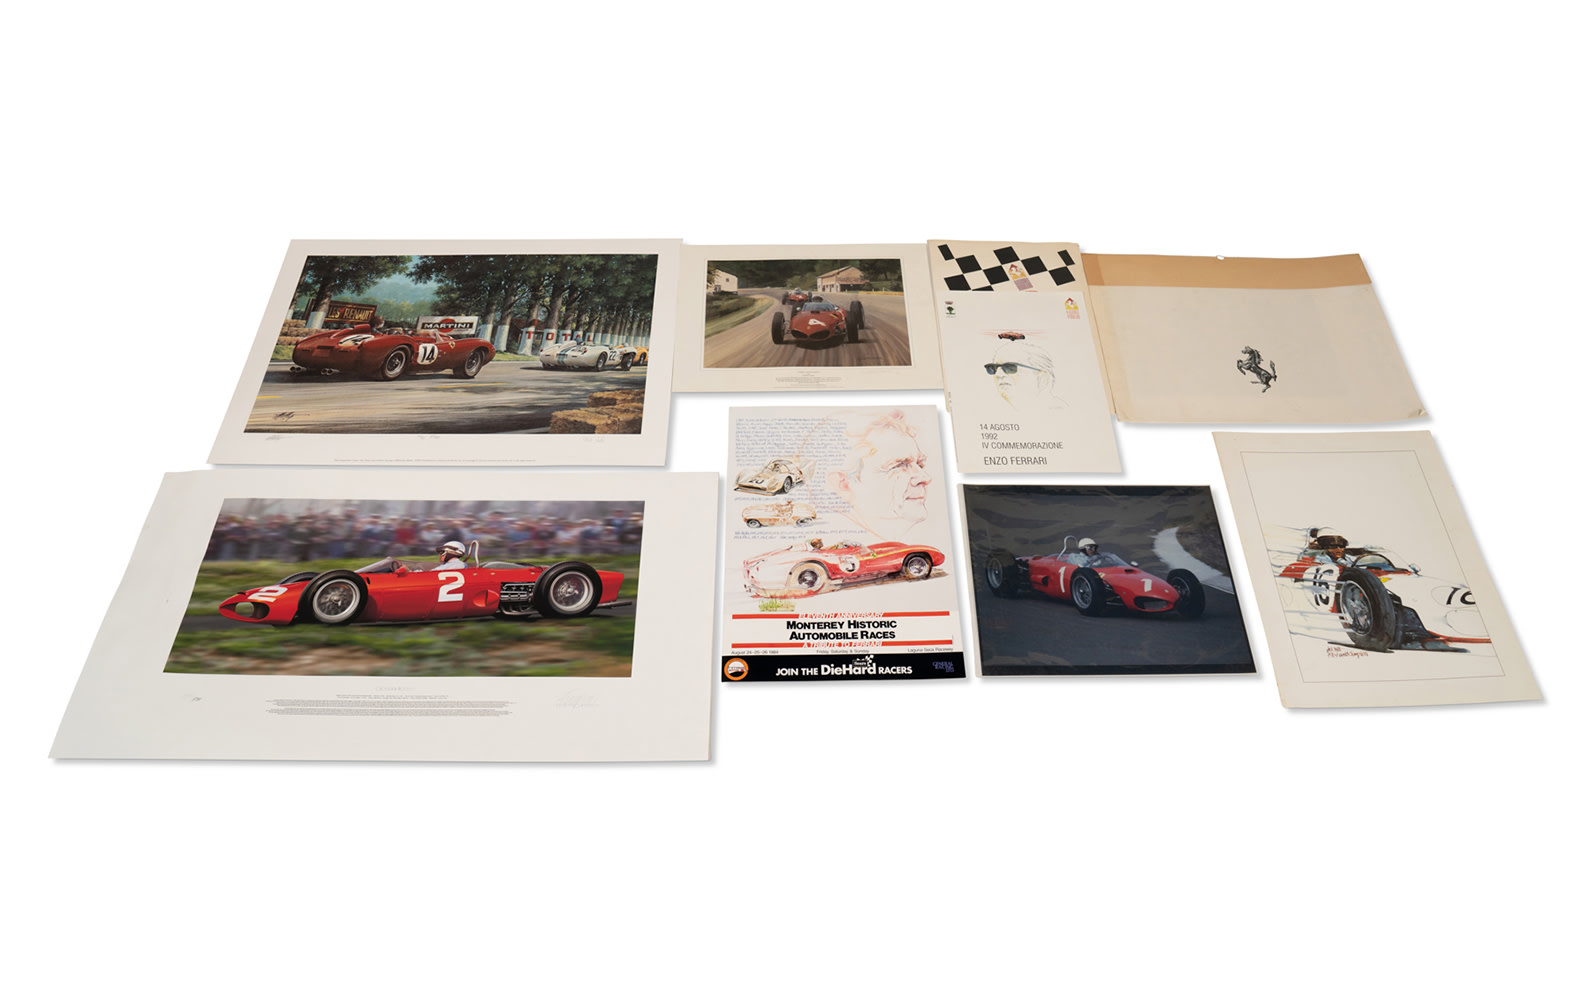 Assorted Ferrari Artwork and Decor, Unframed